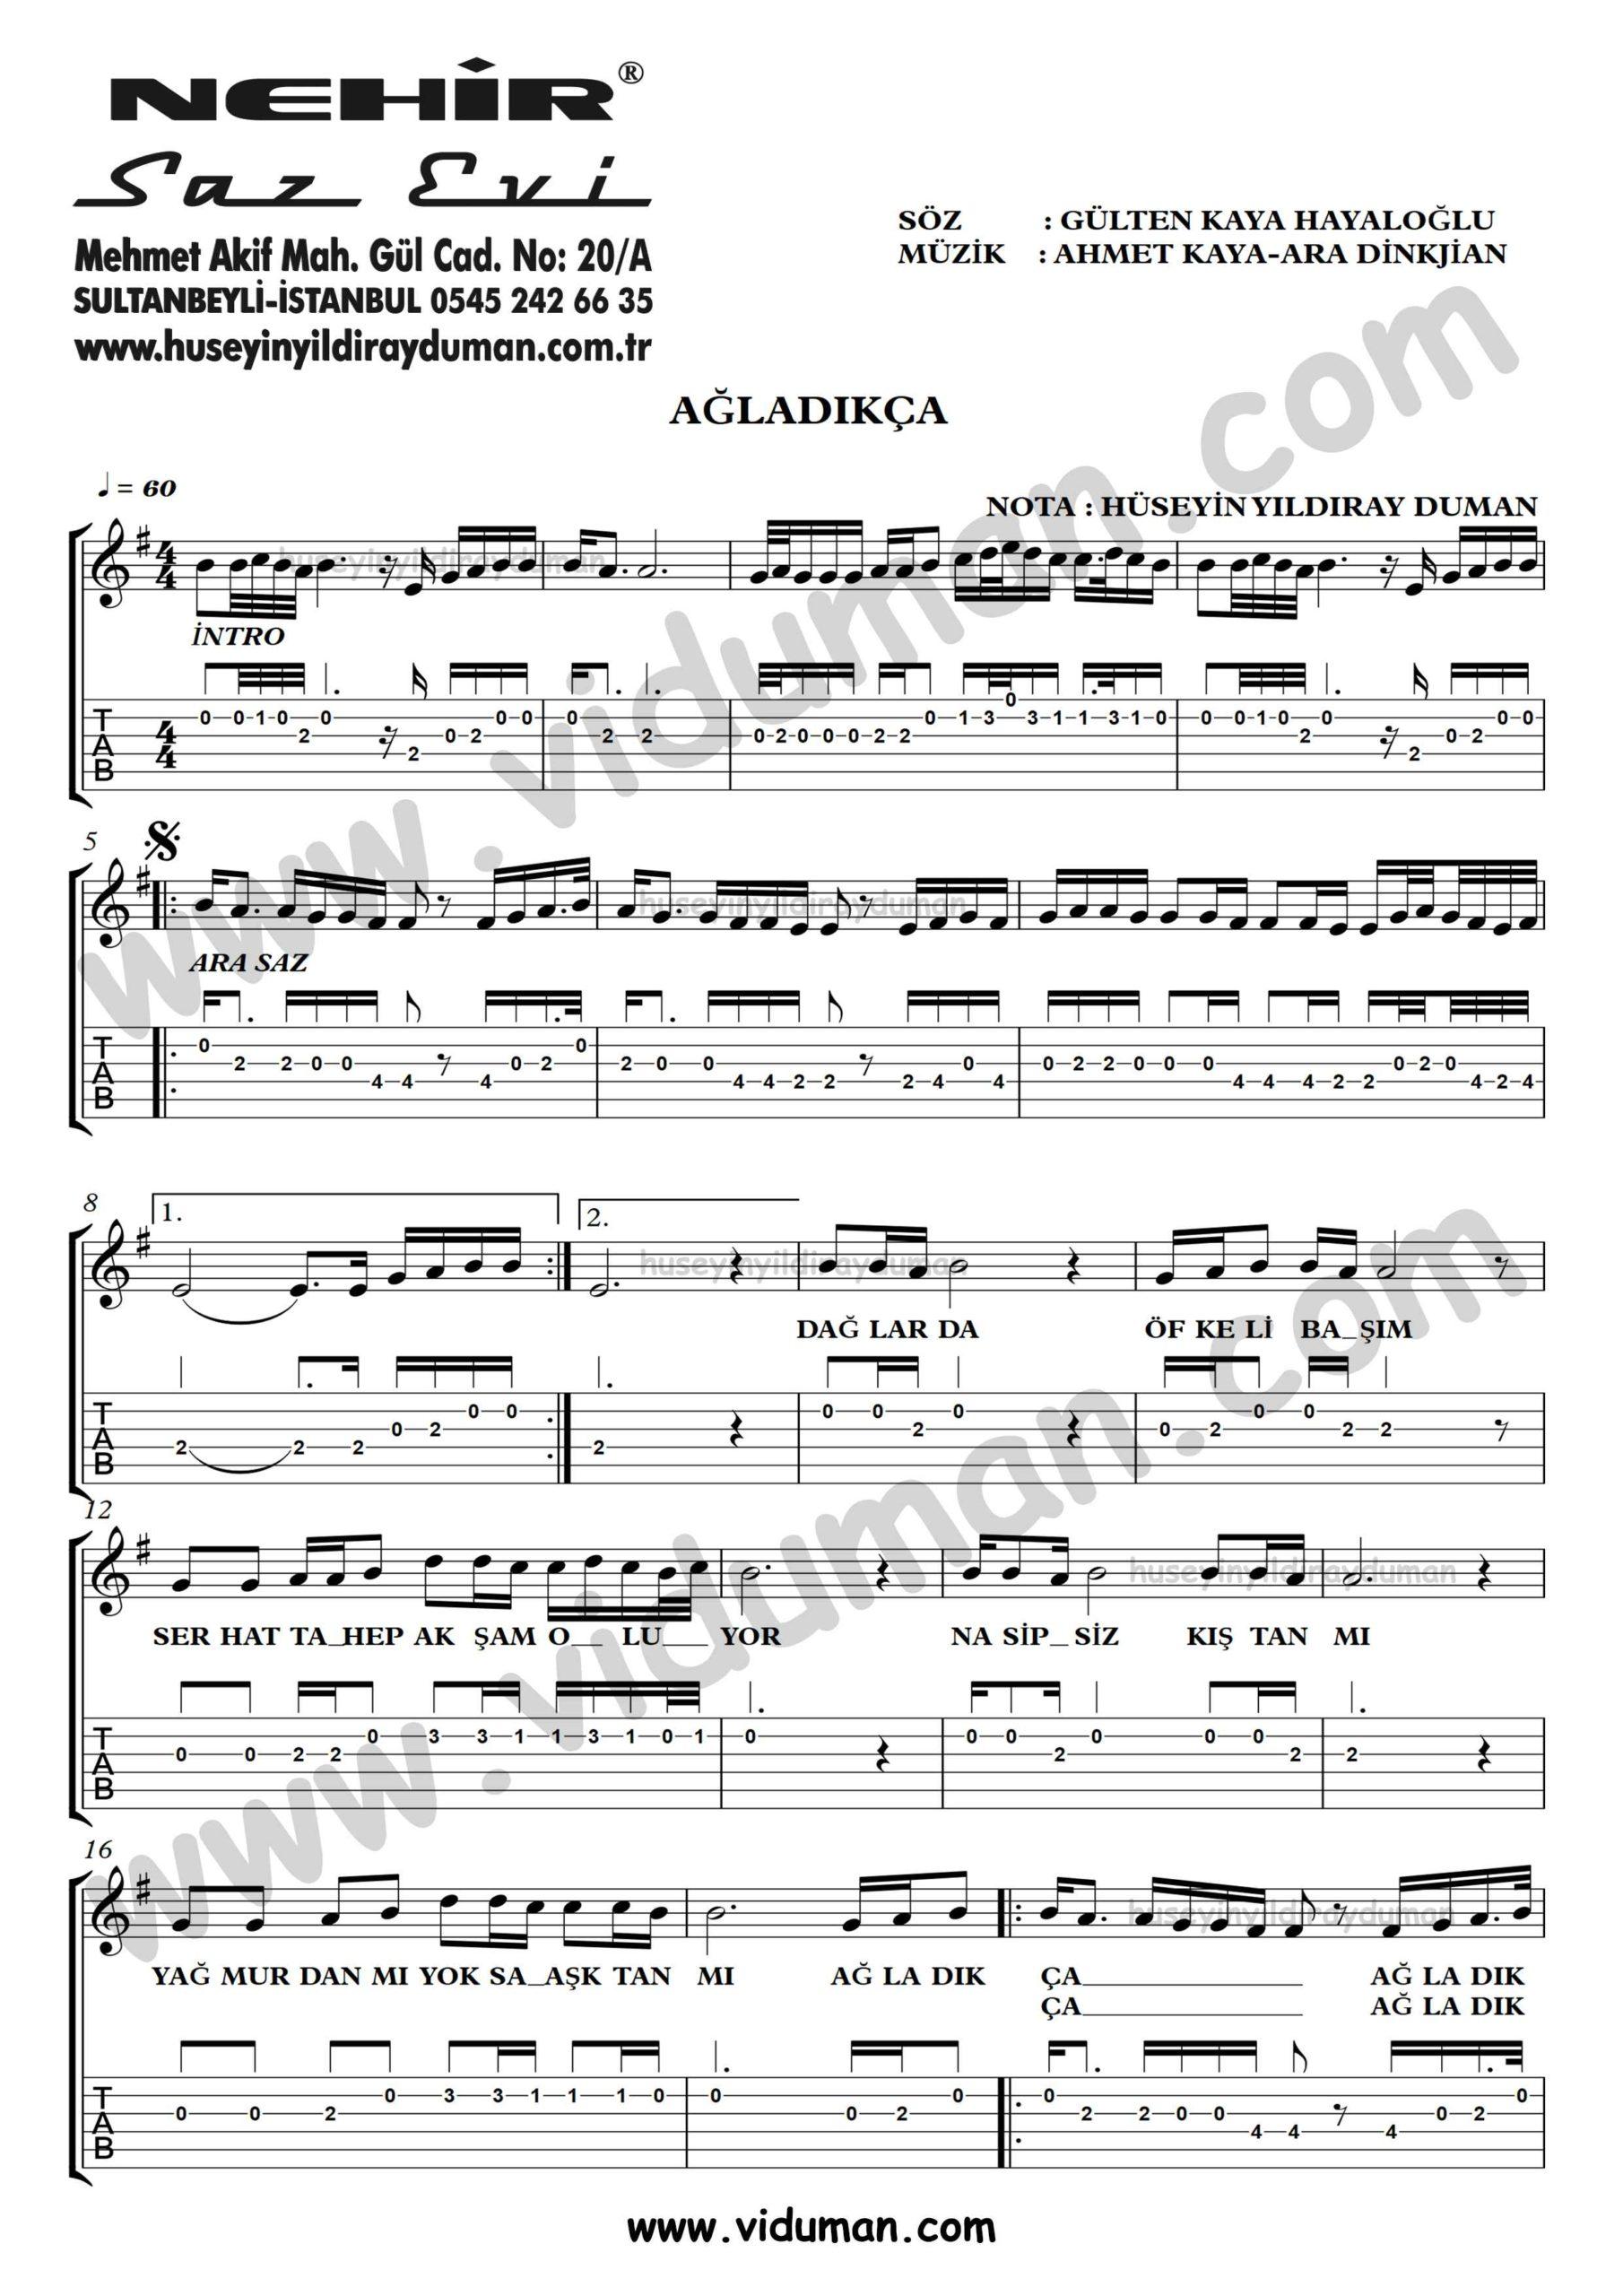 Agladikca_1-Ahmet Kaya-Gitar Tab-Solo Notalari